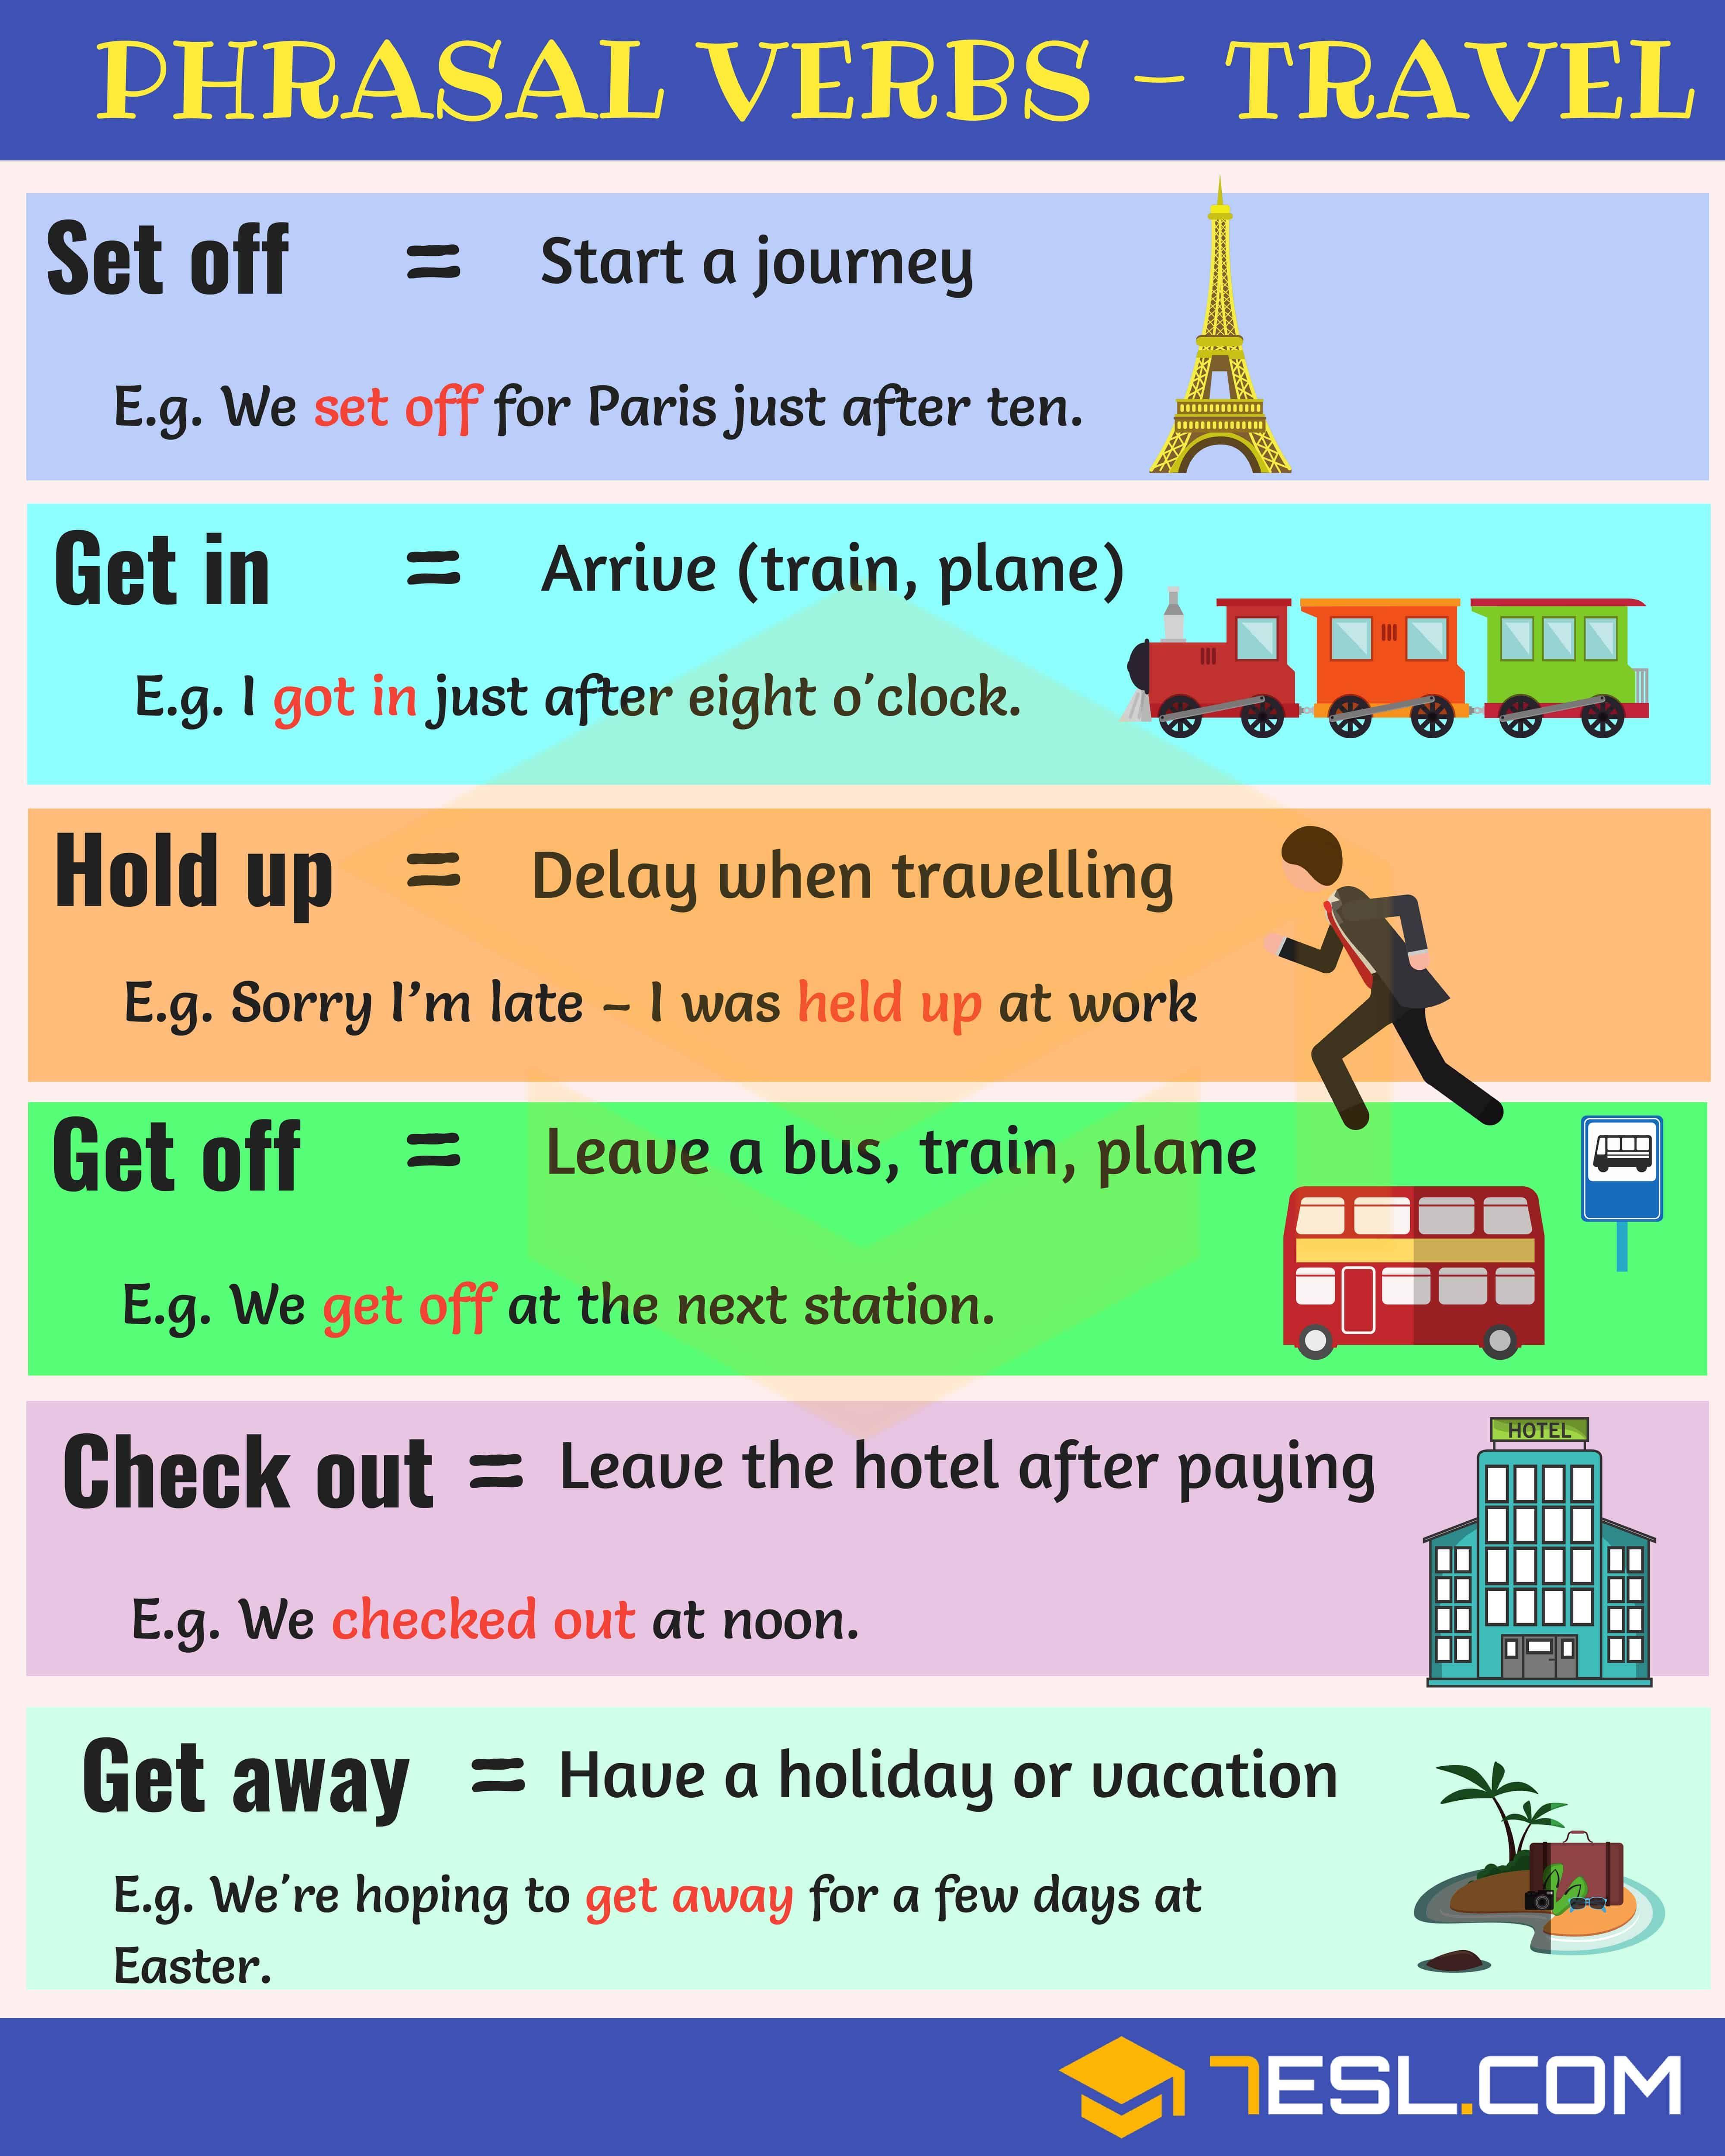 19 Useful Phrasal Verbs For Travel In English 7esl Learn English Travel English English Grammar Book [ 5000 x 4000 Pixel ]